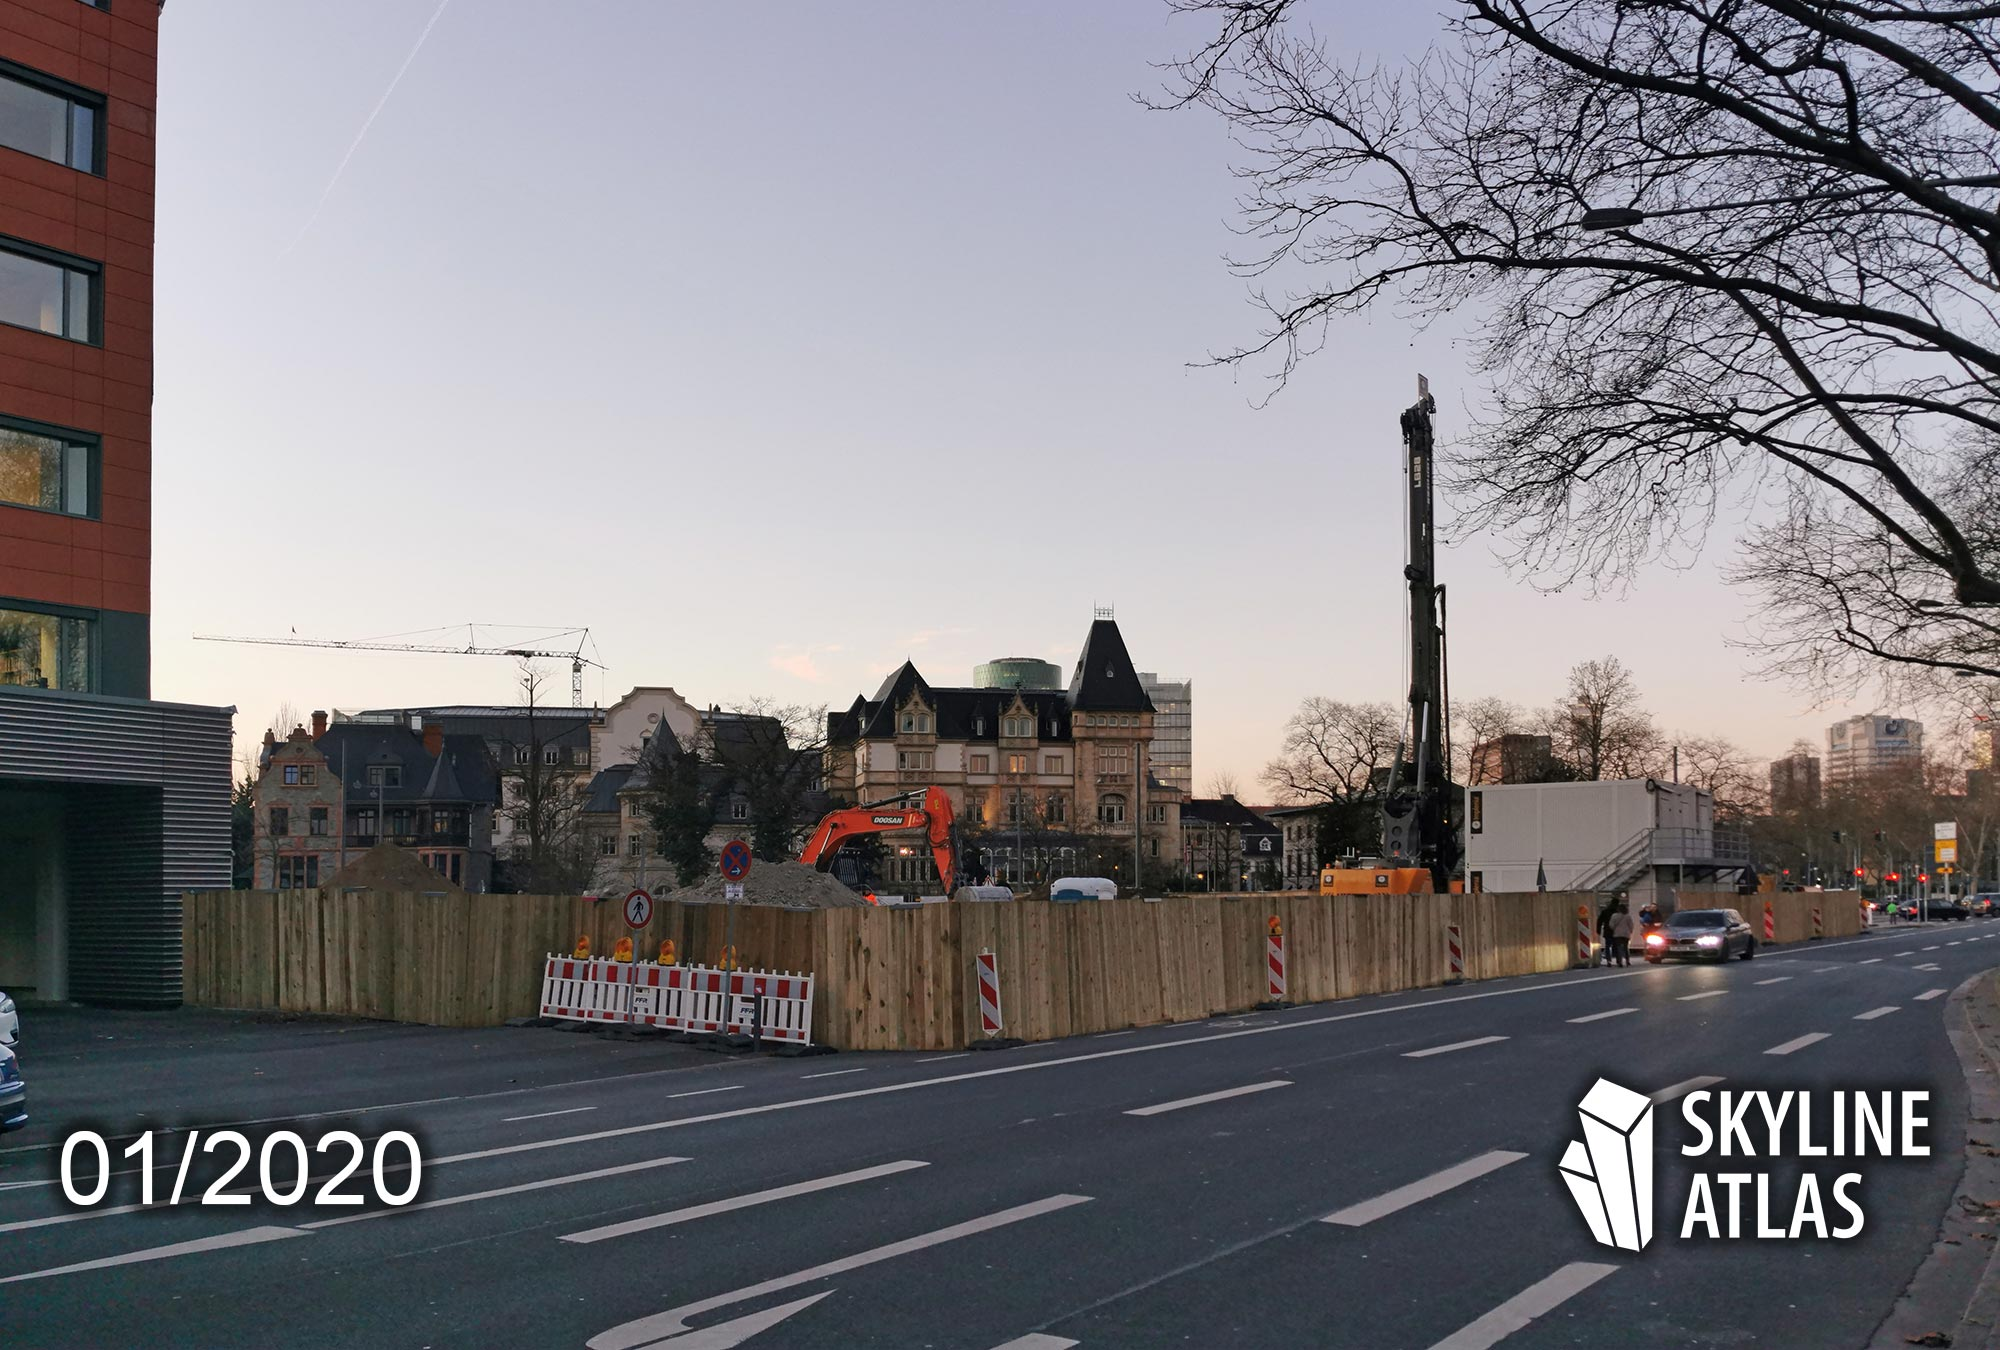 Condominium tower Frankfurt under construction Jan 2020